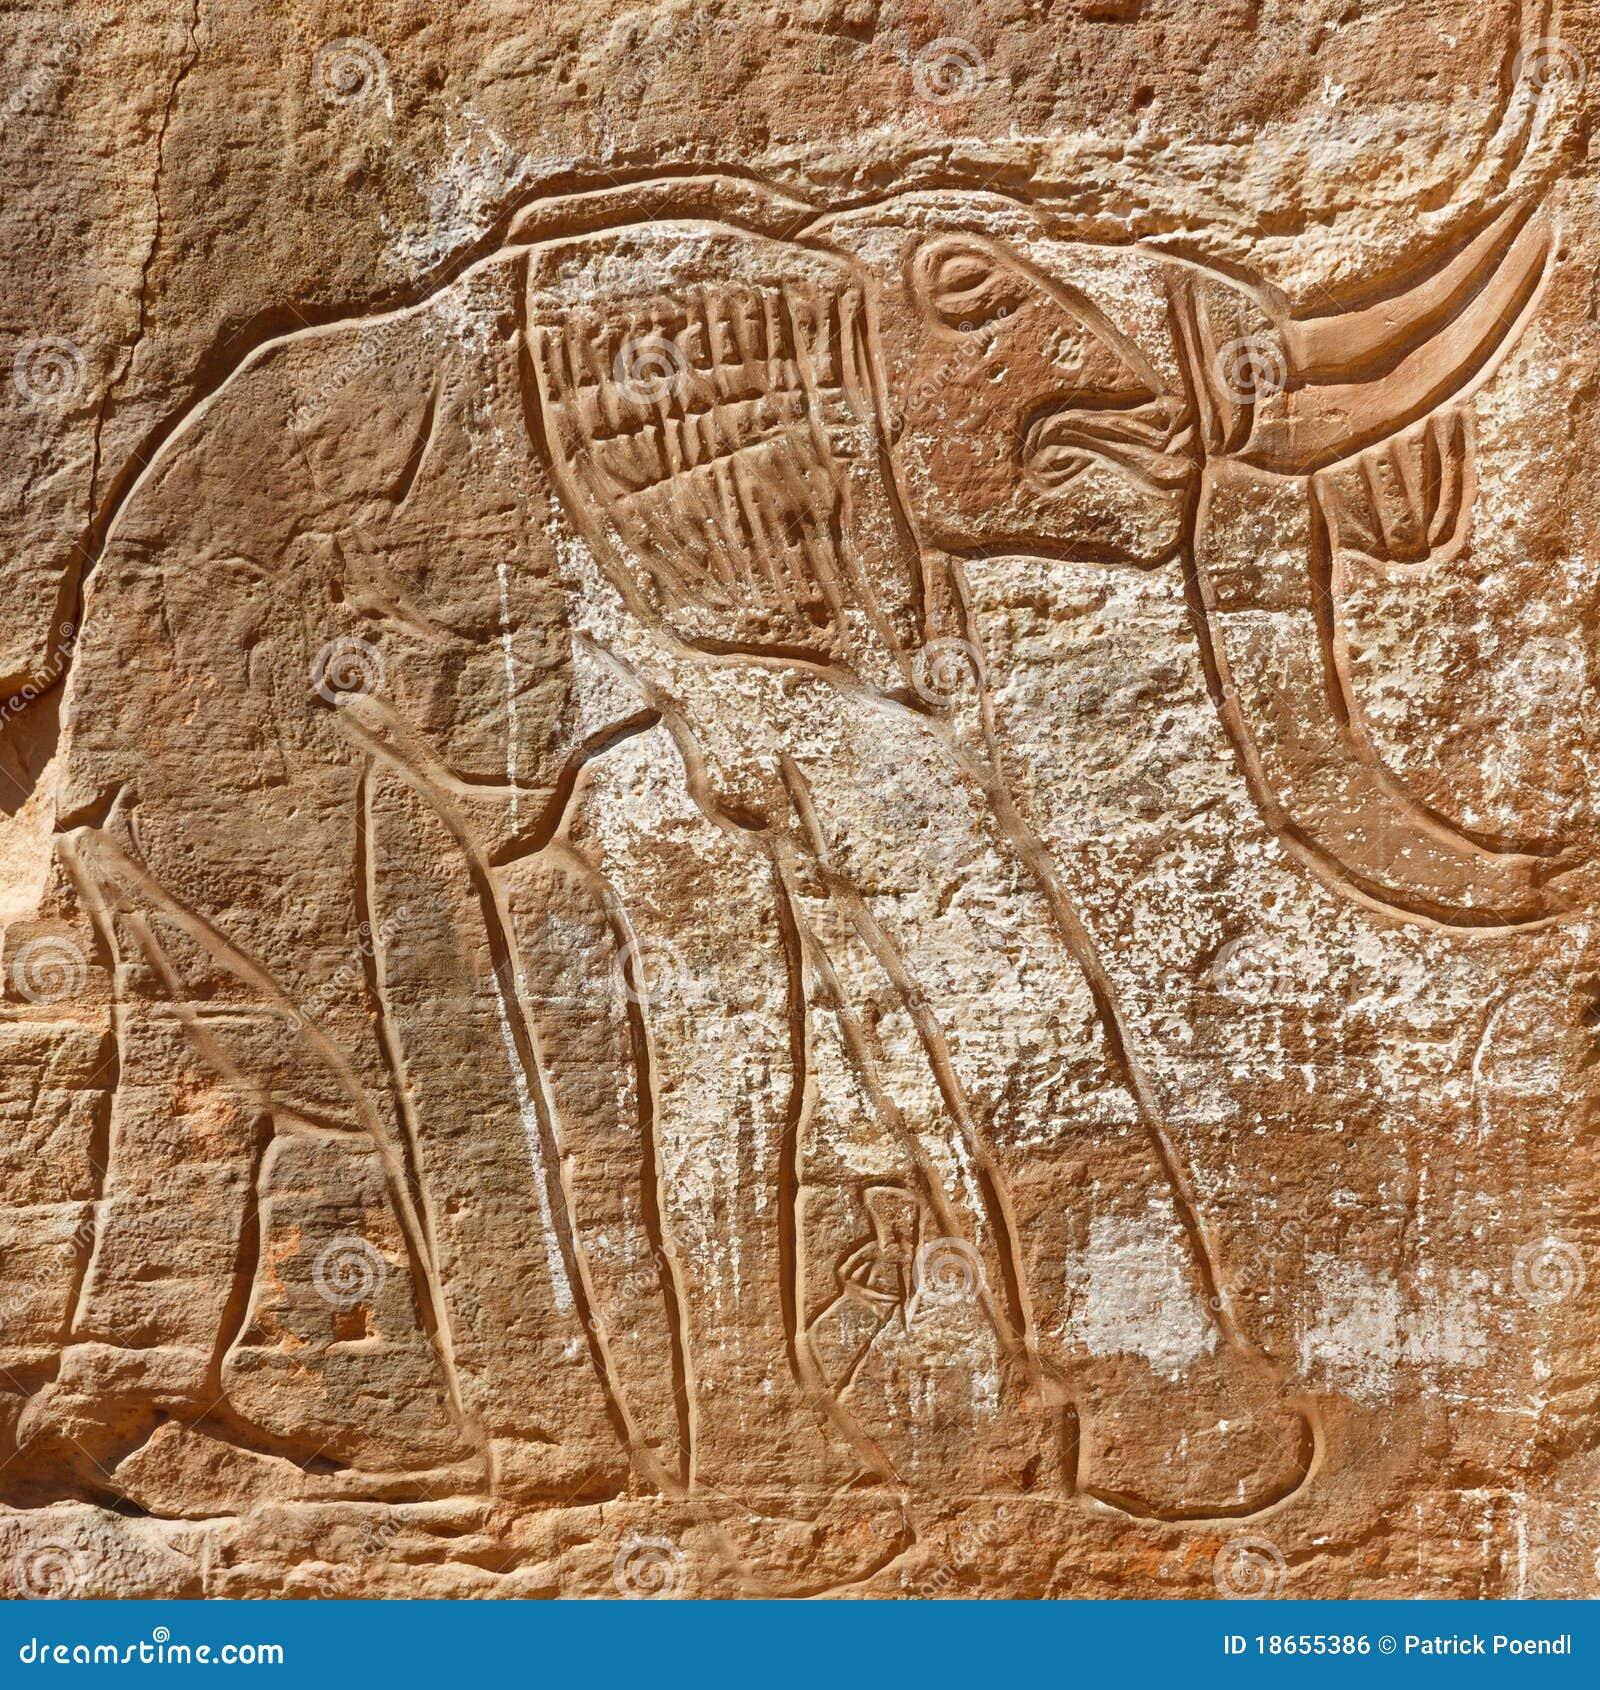 Elephant Rock Engraving - Wadi Mathendous, Libya